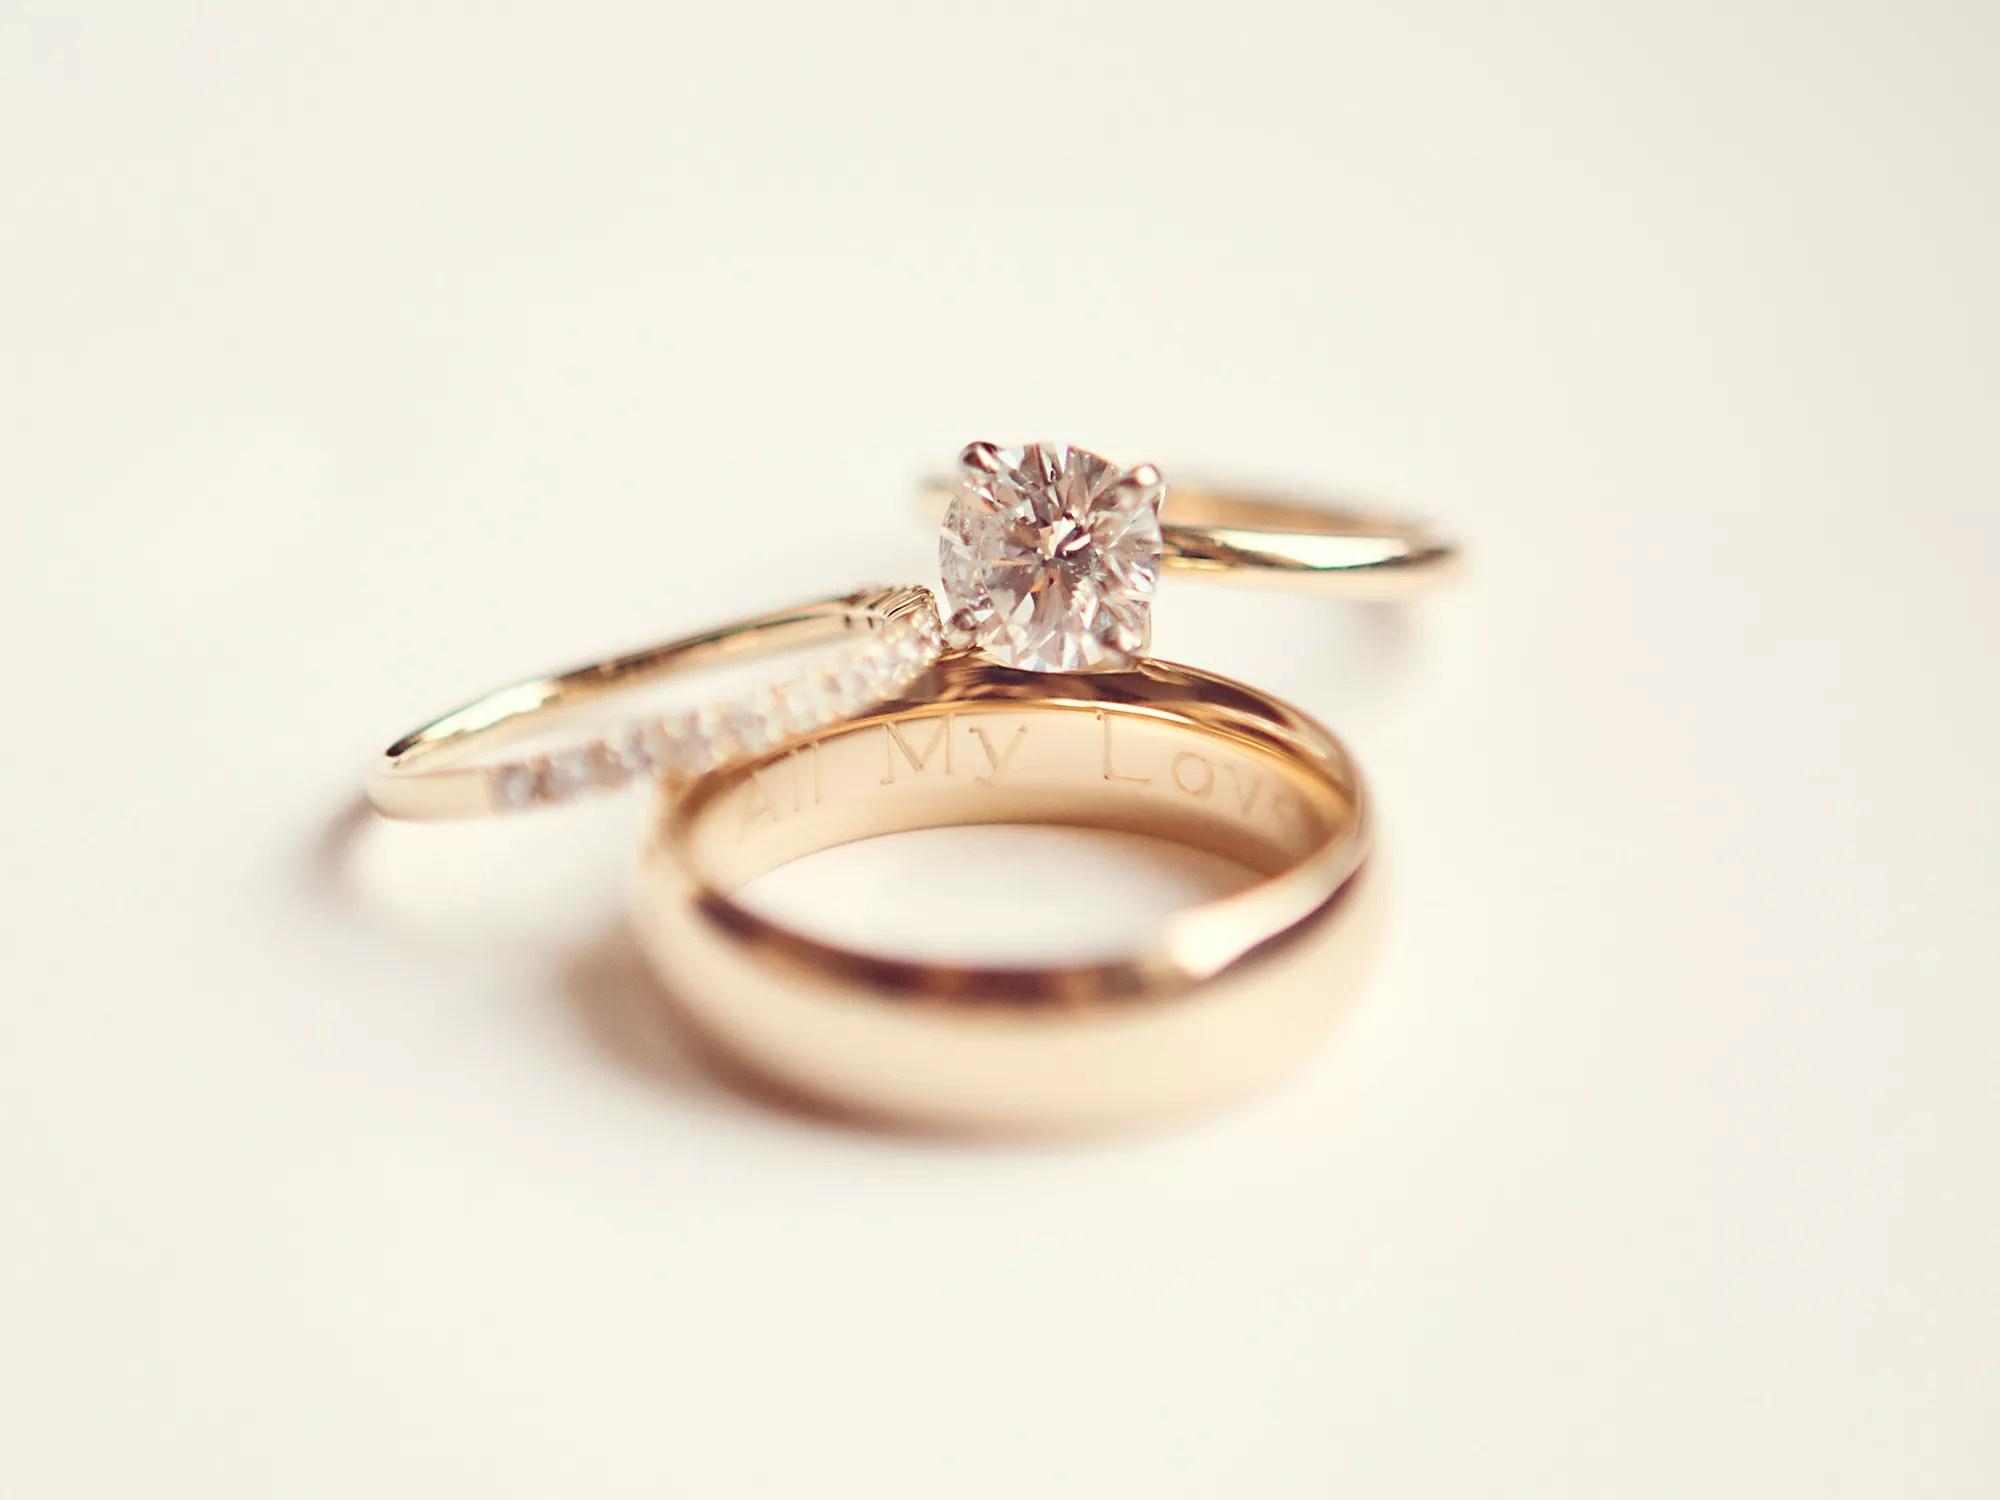 Wedding Ring Engraving Ideas & Tips